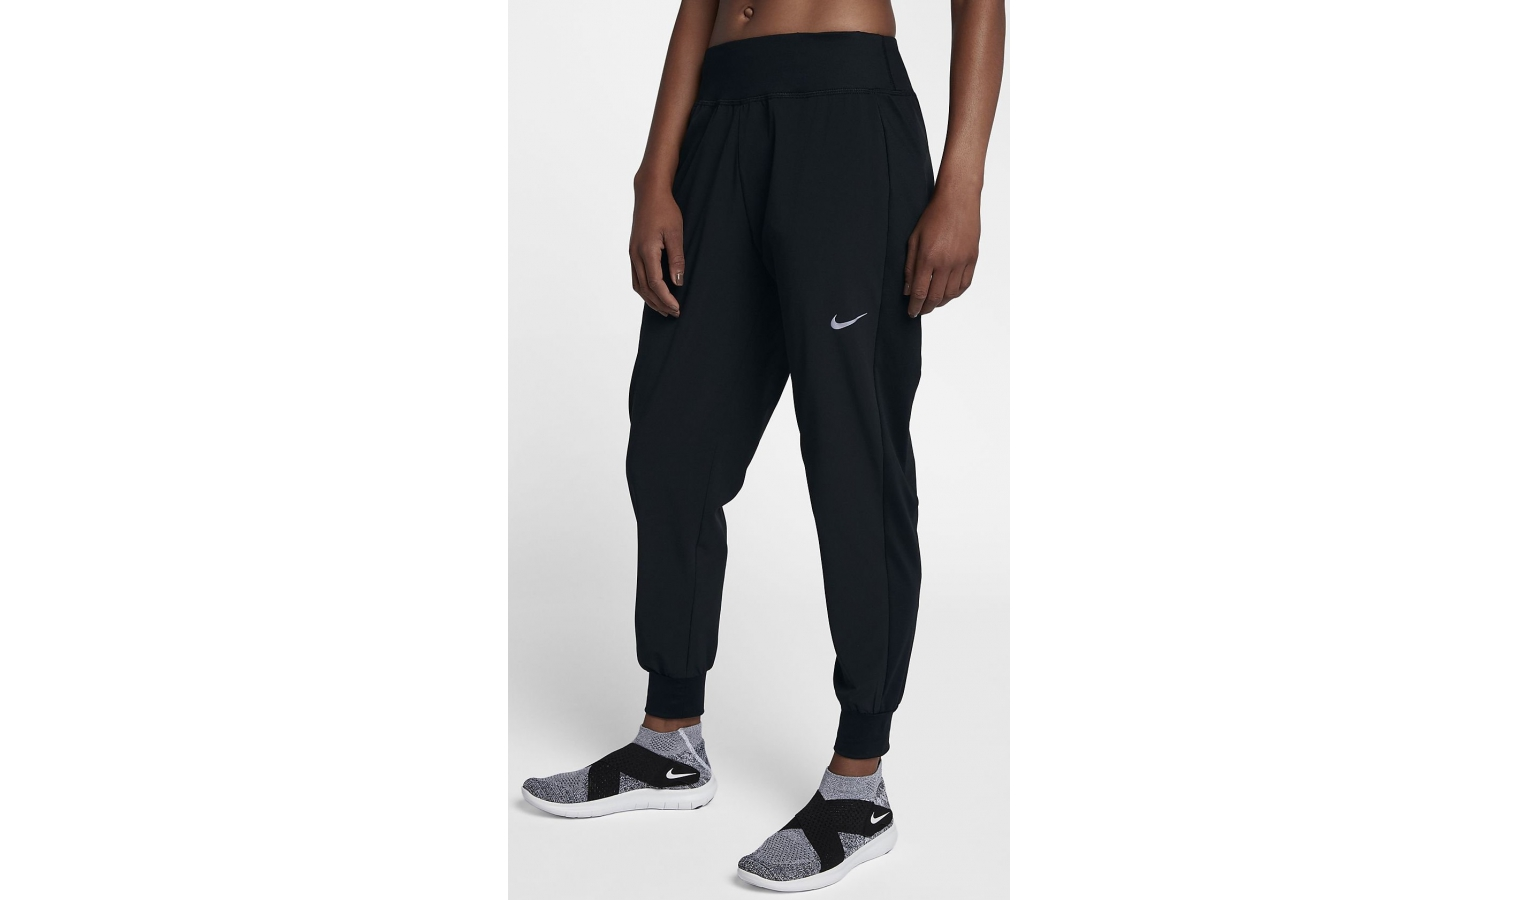 a7141e47ff28 Dámske športové tepláky Nike FLX ESSNTL PANT W čierne